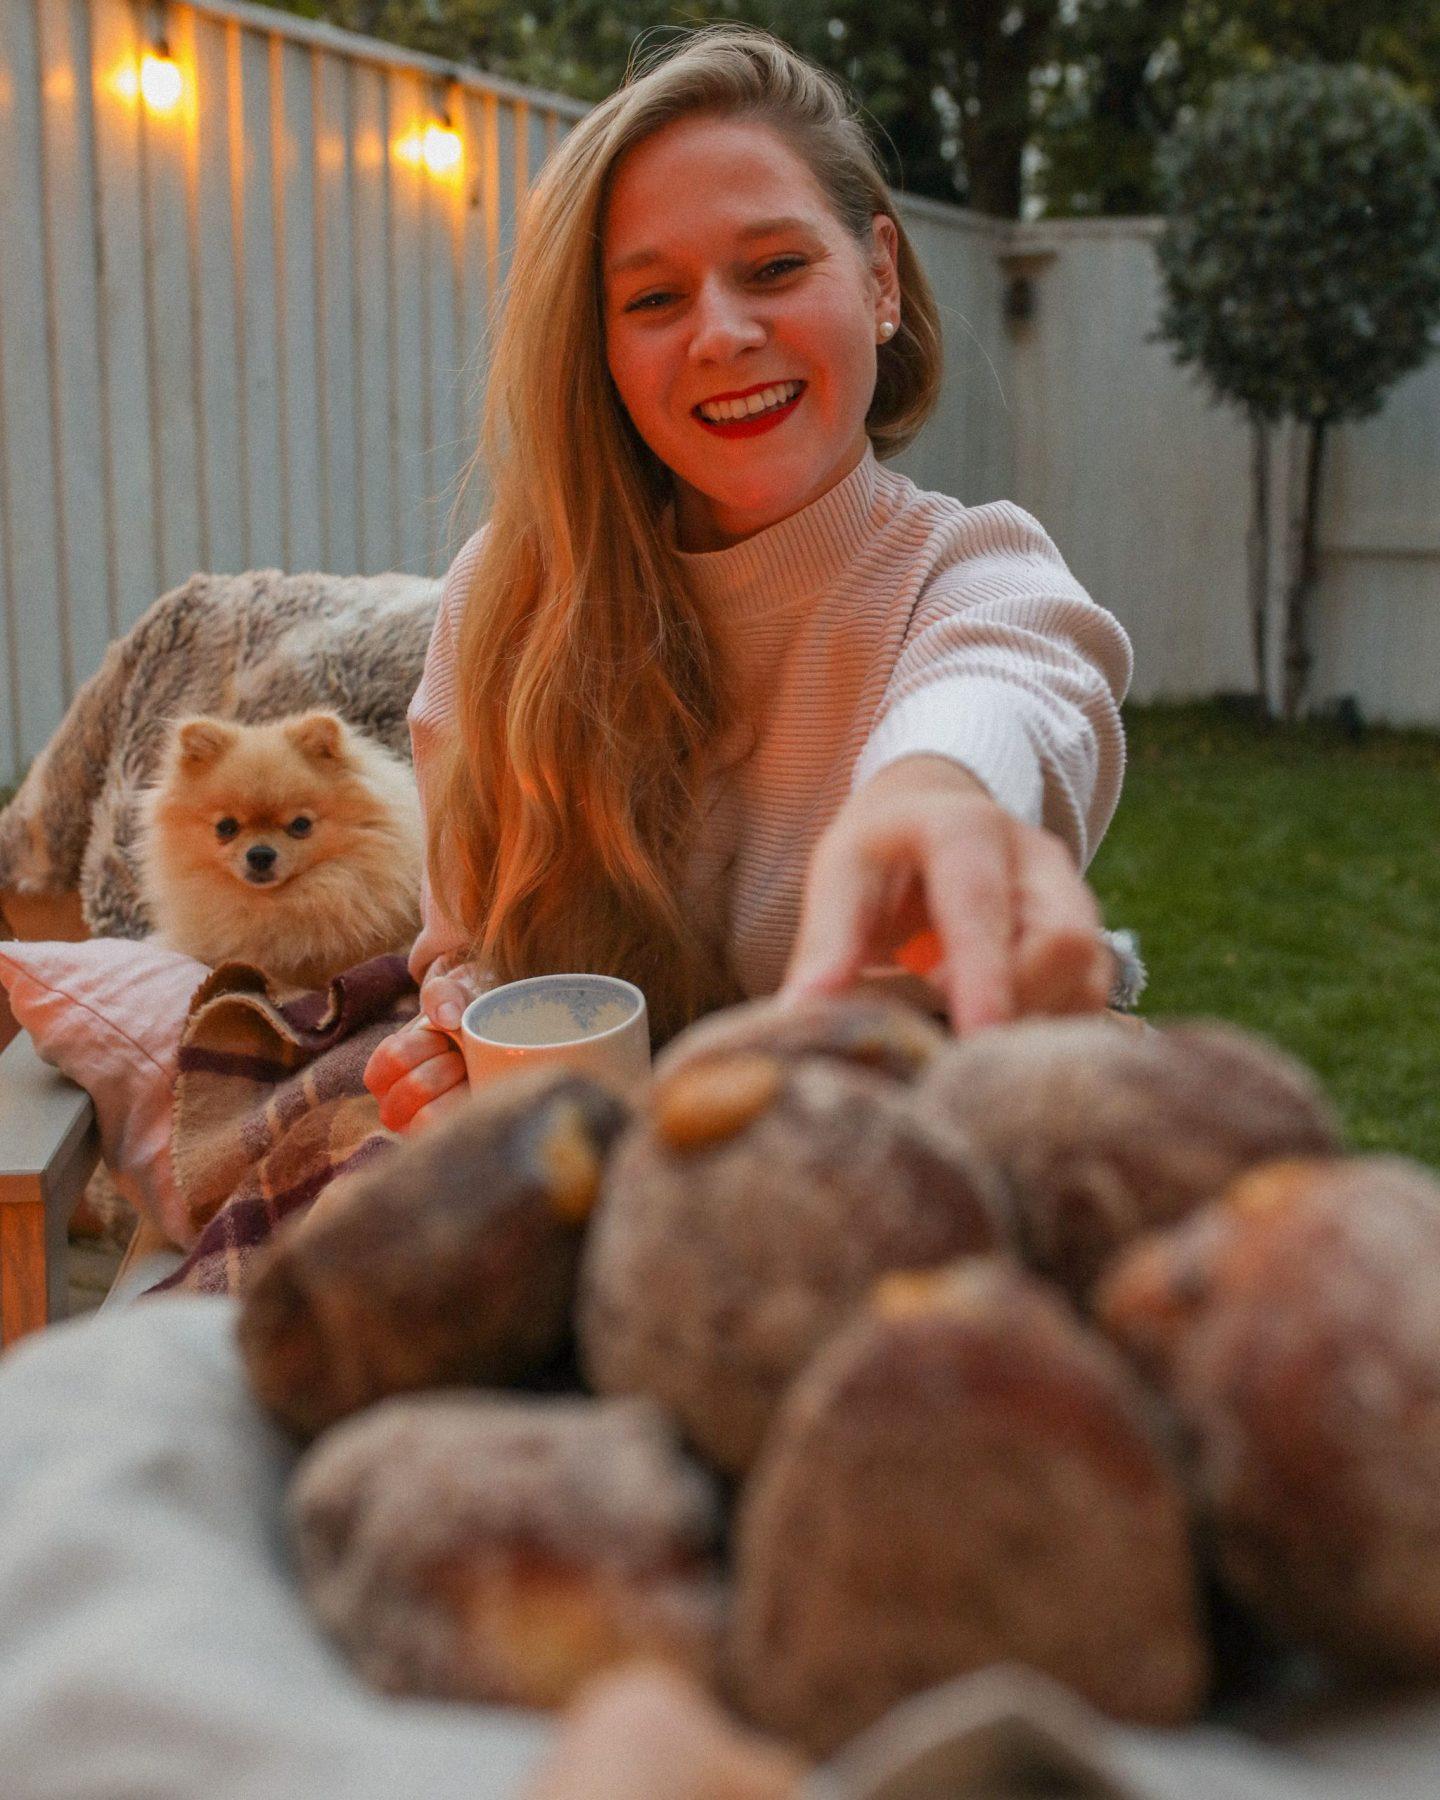 Toffee Apple doughnuts with cinnamon sugar, Katie Heath, KALANCHOE